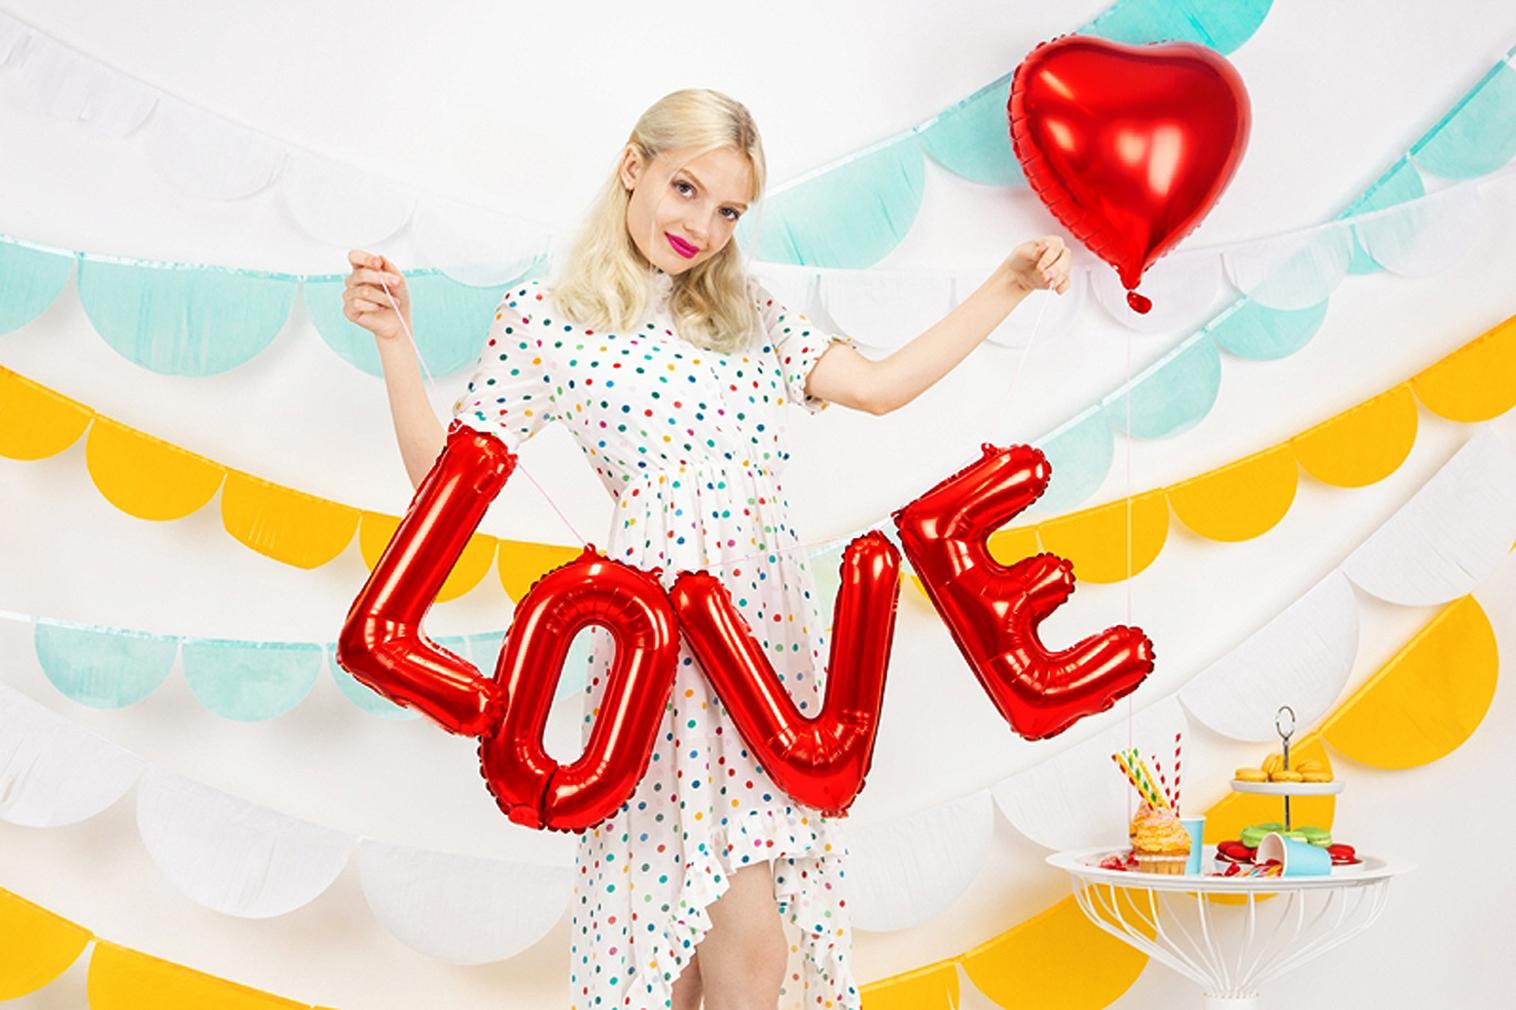 Folienballon LOVE Dekoration rot Ballons Luftballons mit Luftpumpe Partyballon Liebe